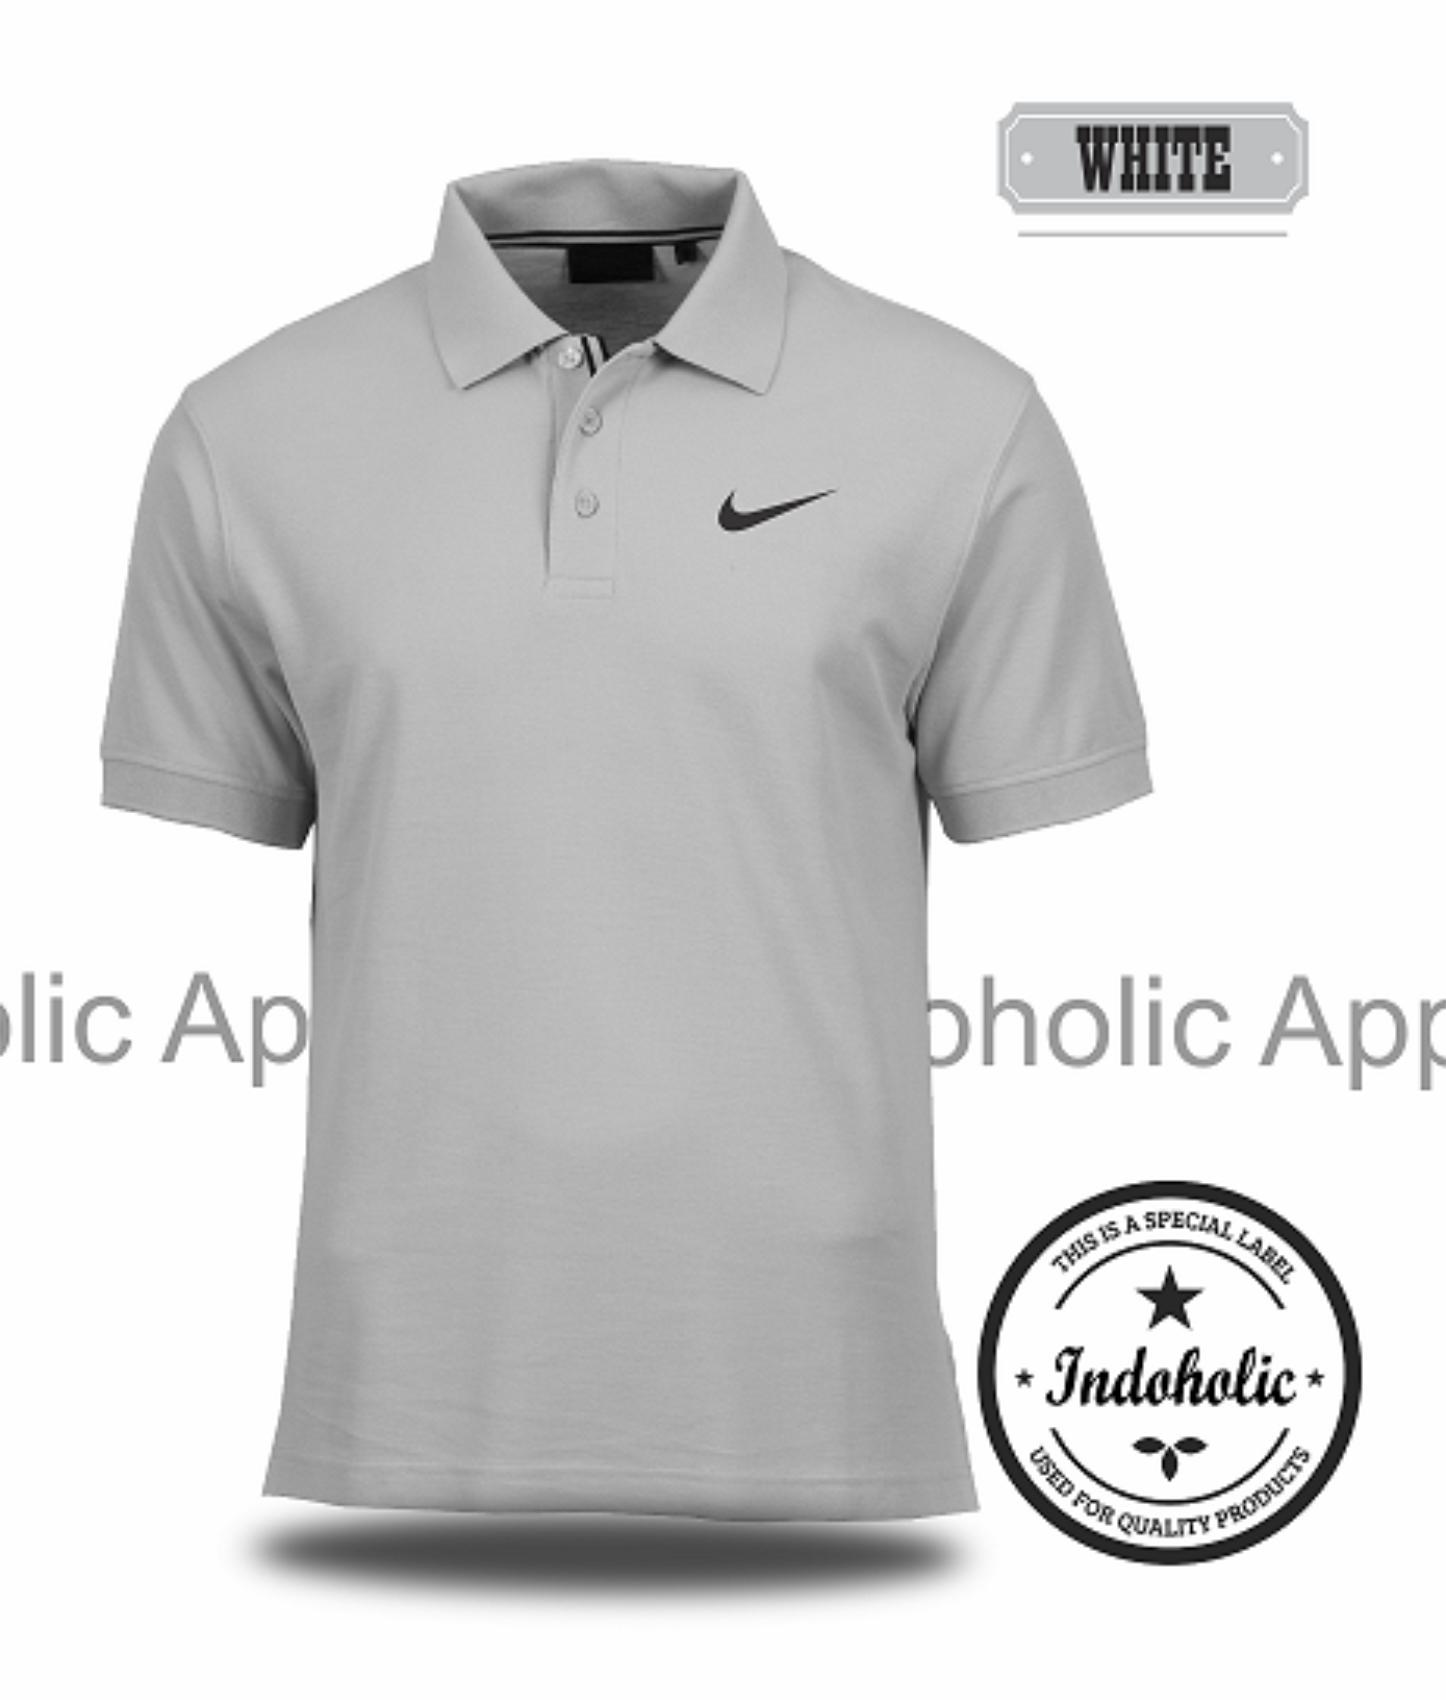 Polo Shirt Pria Terbaru Murah Kaos Kerah Bahan Lacoste Pique Tebal Distro Sport Olahraga Jersey Original Branded T Fashion Wanita Cowok